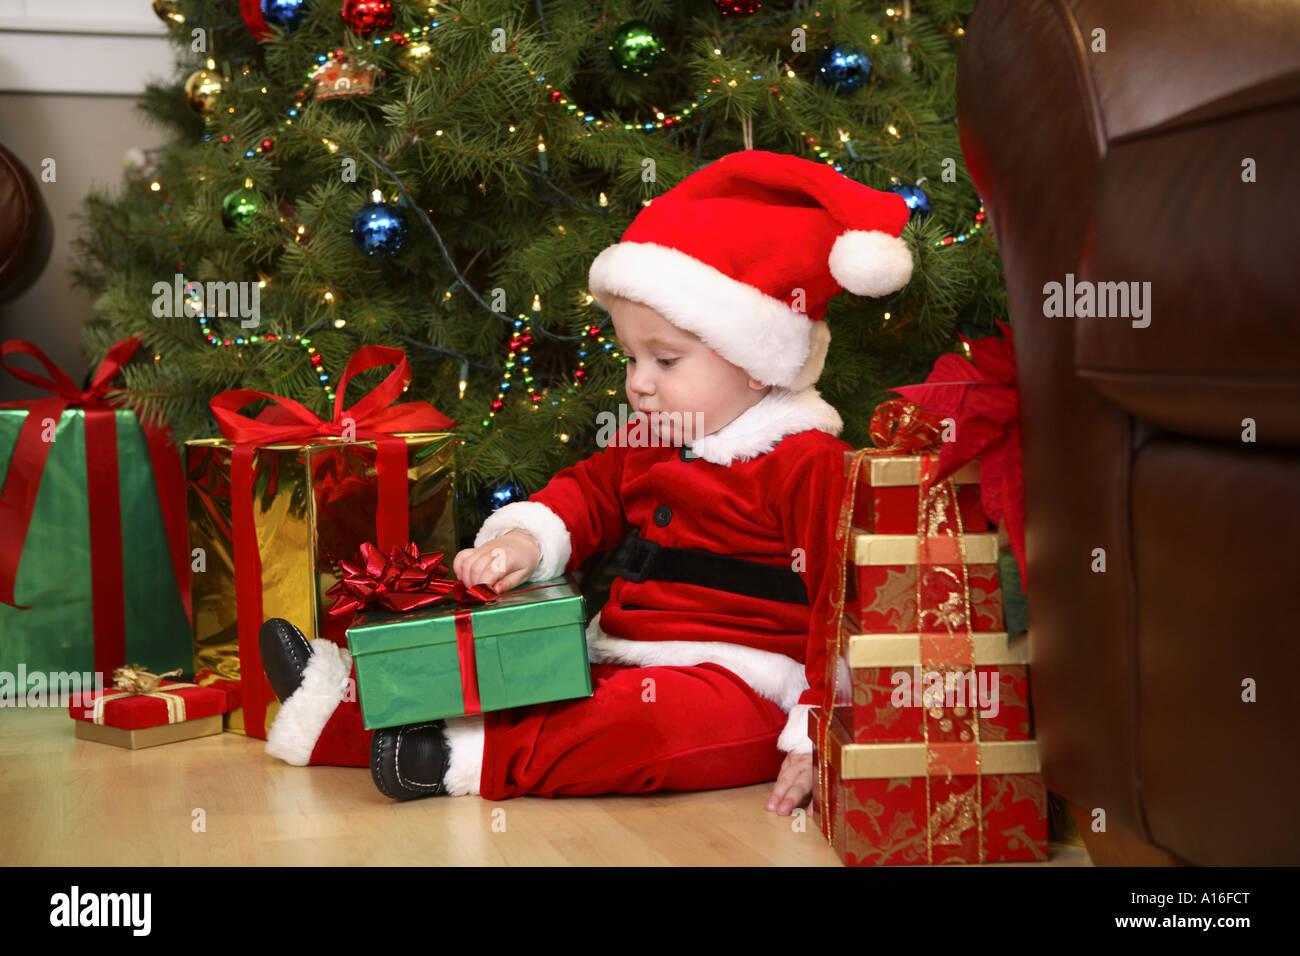 One year old boy dressed like Santa opening presents Stock Photo ...